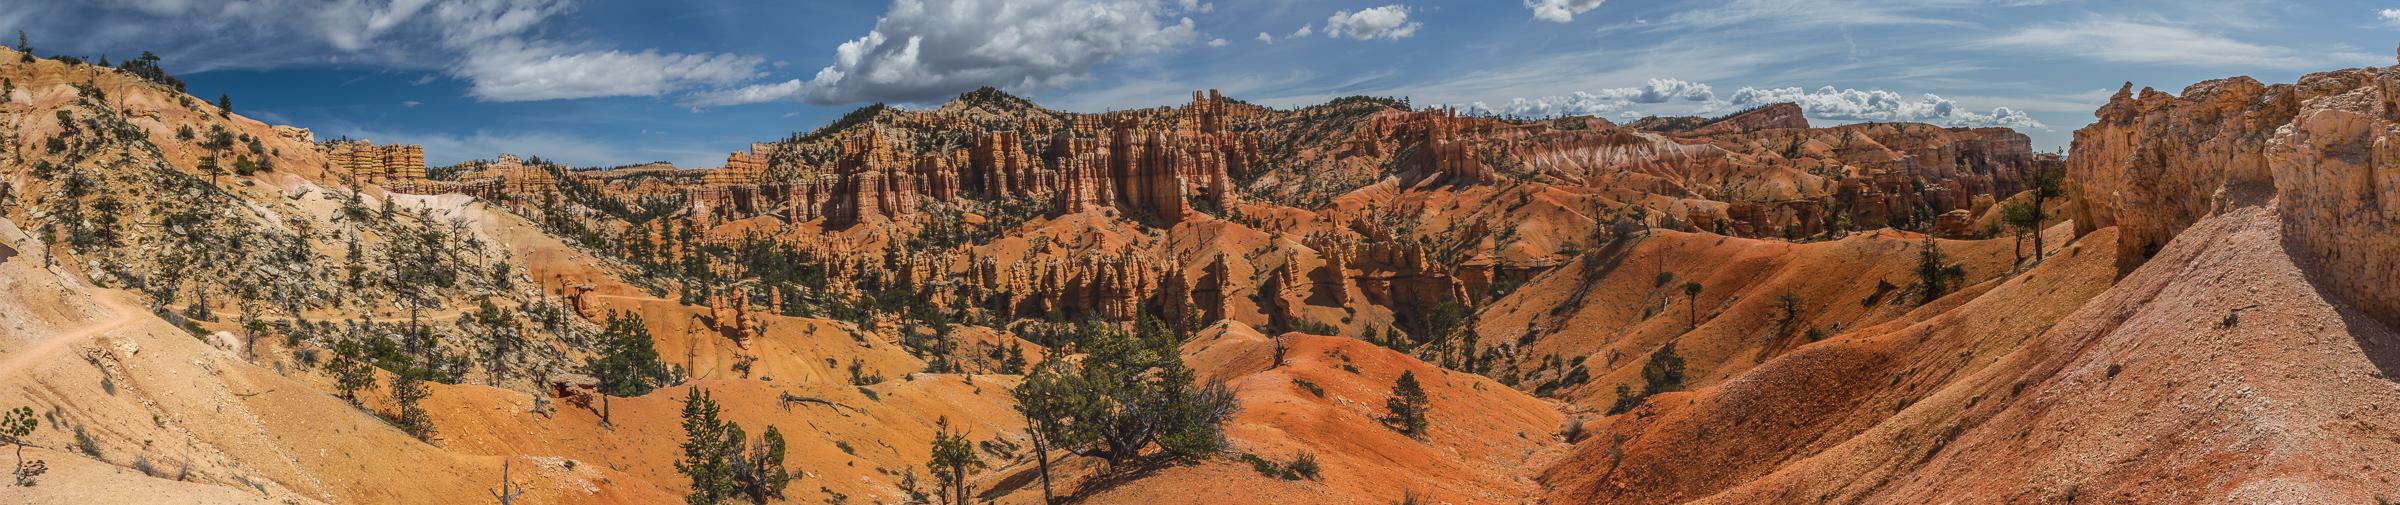 Panorama im Bryce Canyon.